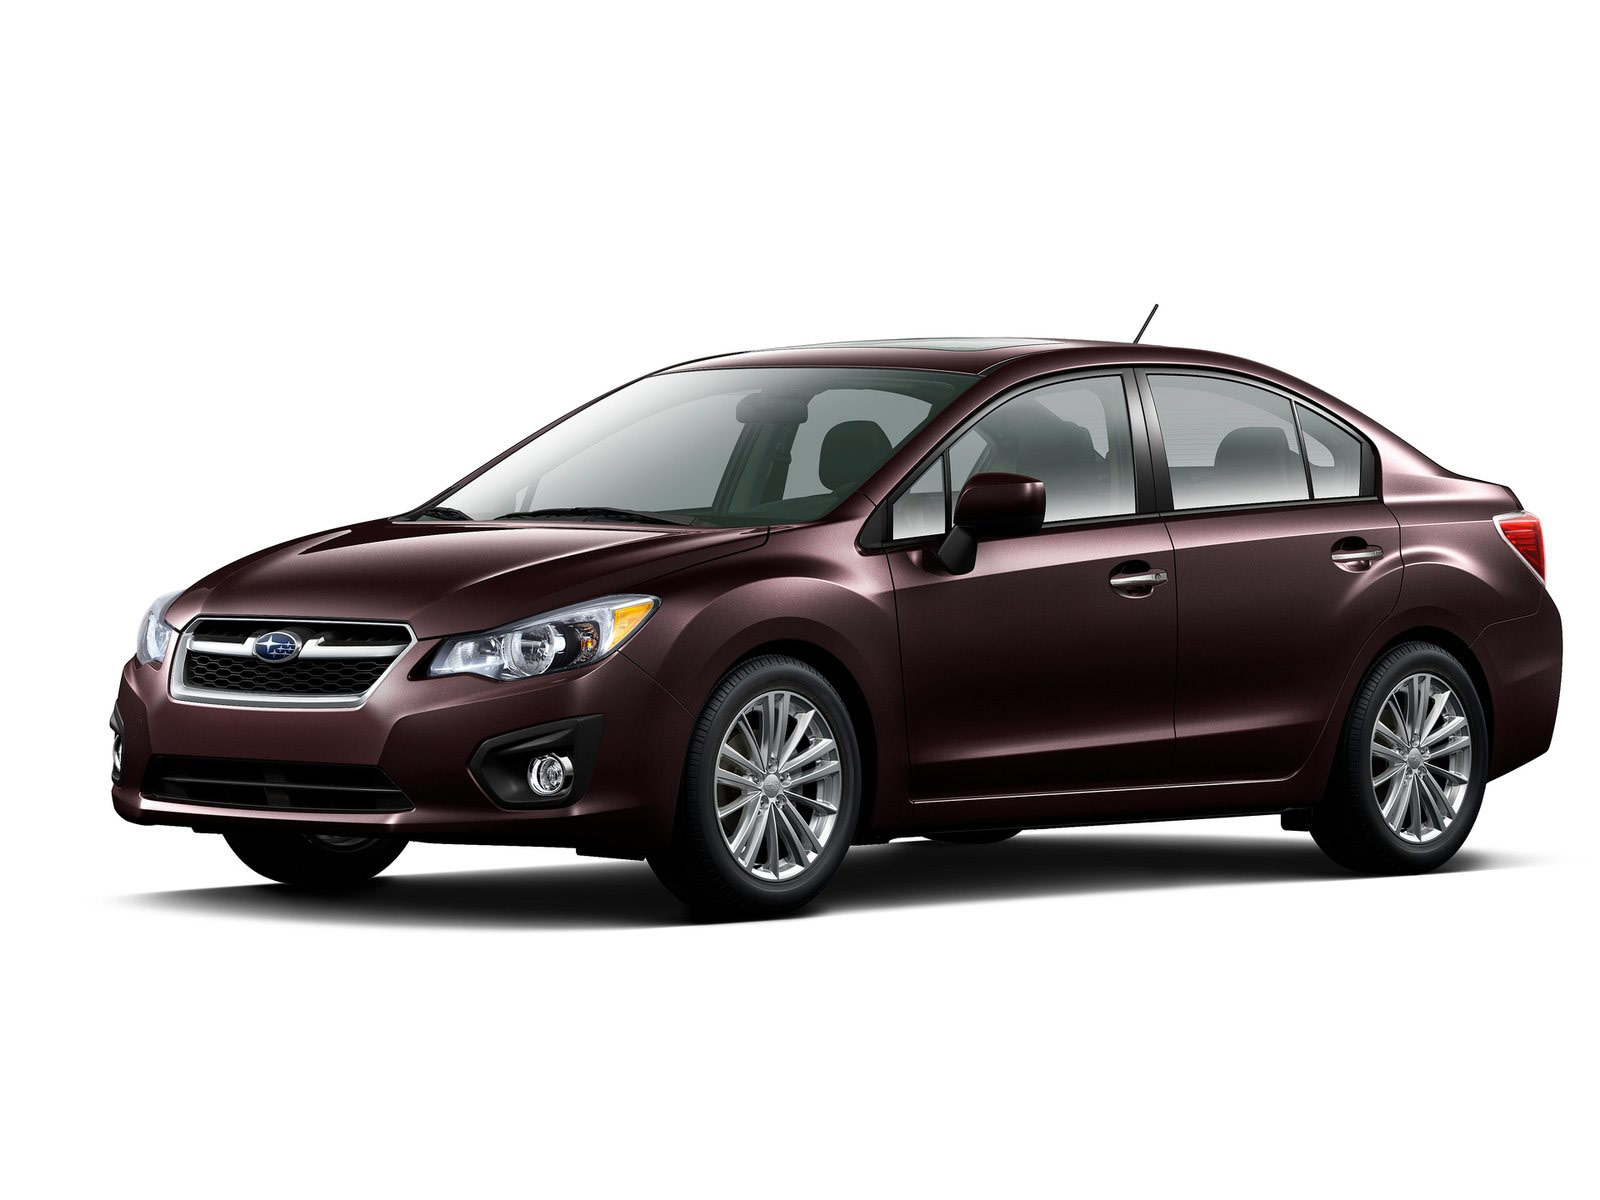 Jm Auto Sales >> Japanese car photos 2012 SUBARU Impreza